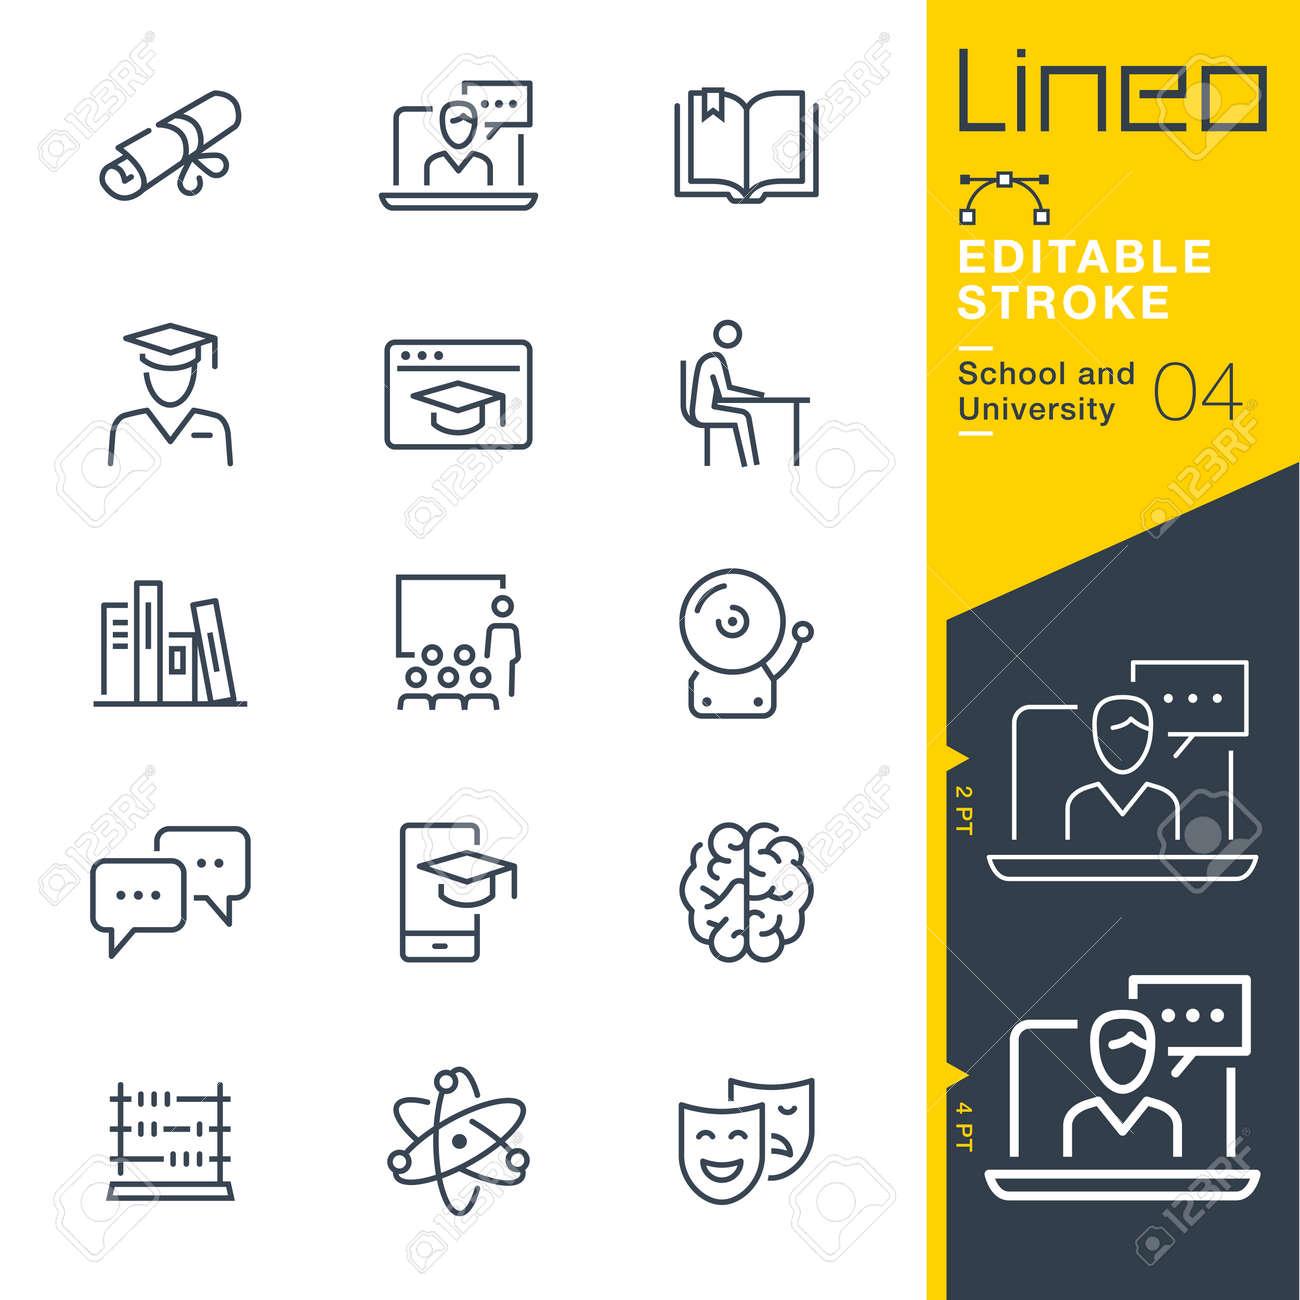 Lineo Editable Stroke - School line icons - 92652290